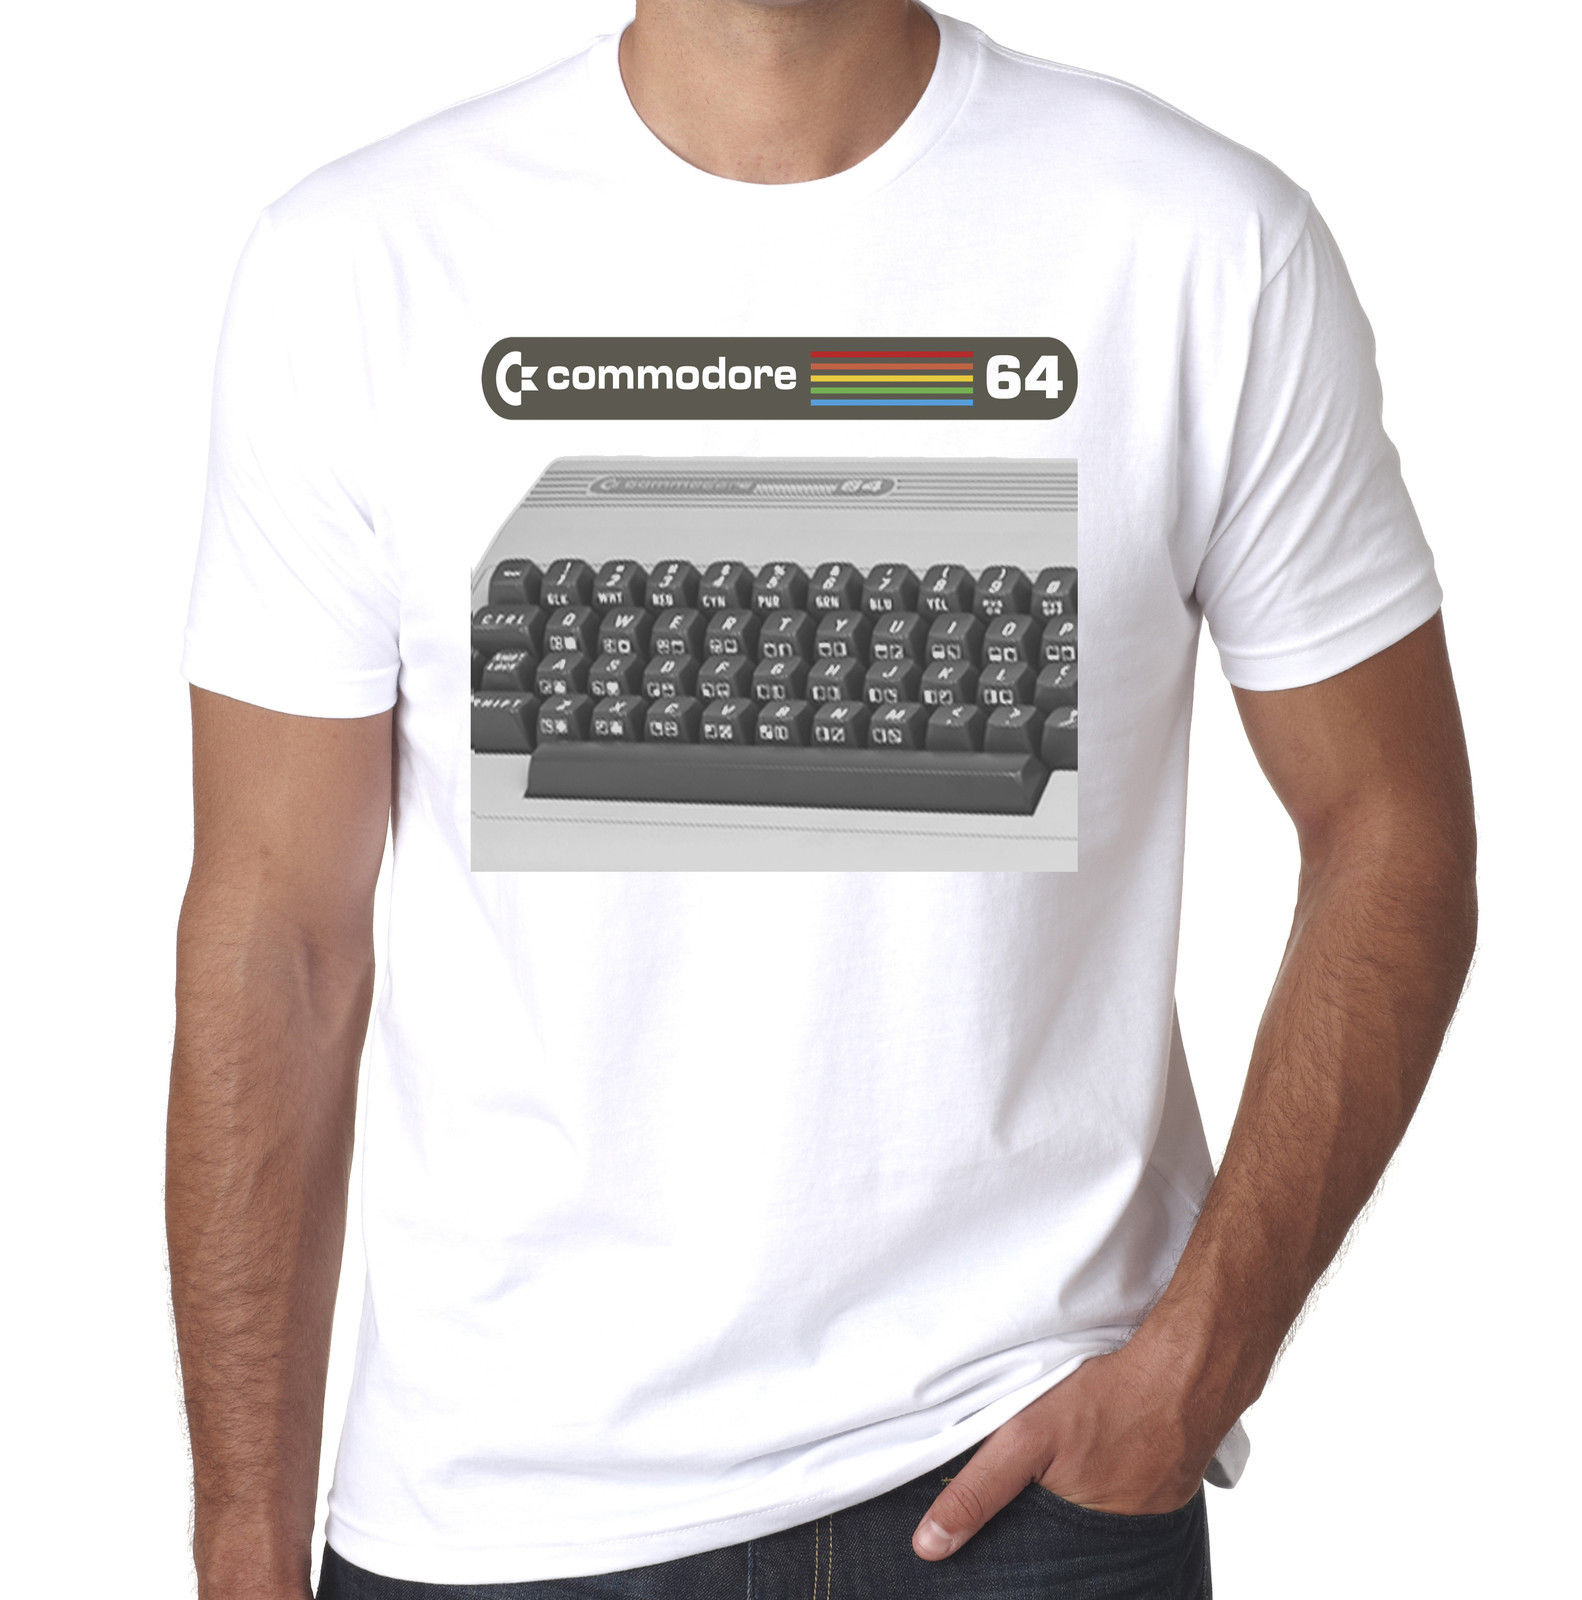 Commodore 64 vintage 80 s компьютер pc ИТ crowd geek печатных футболку